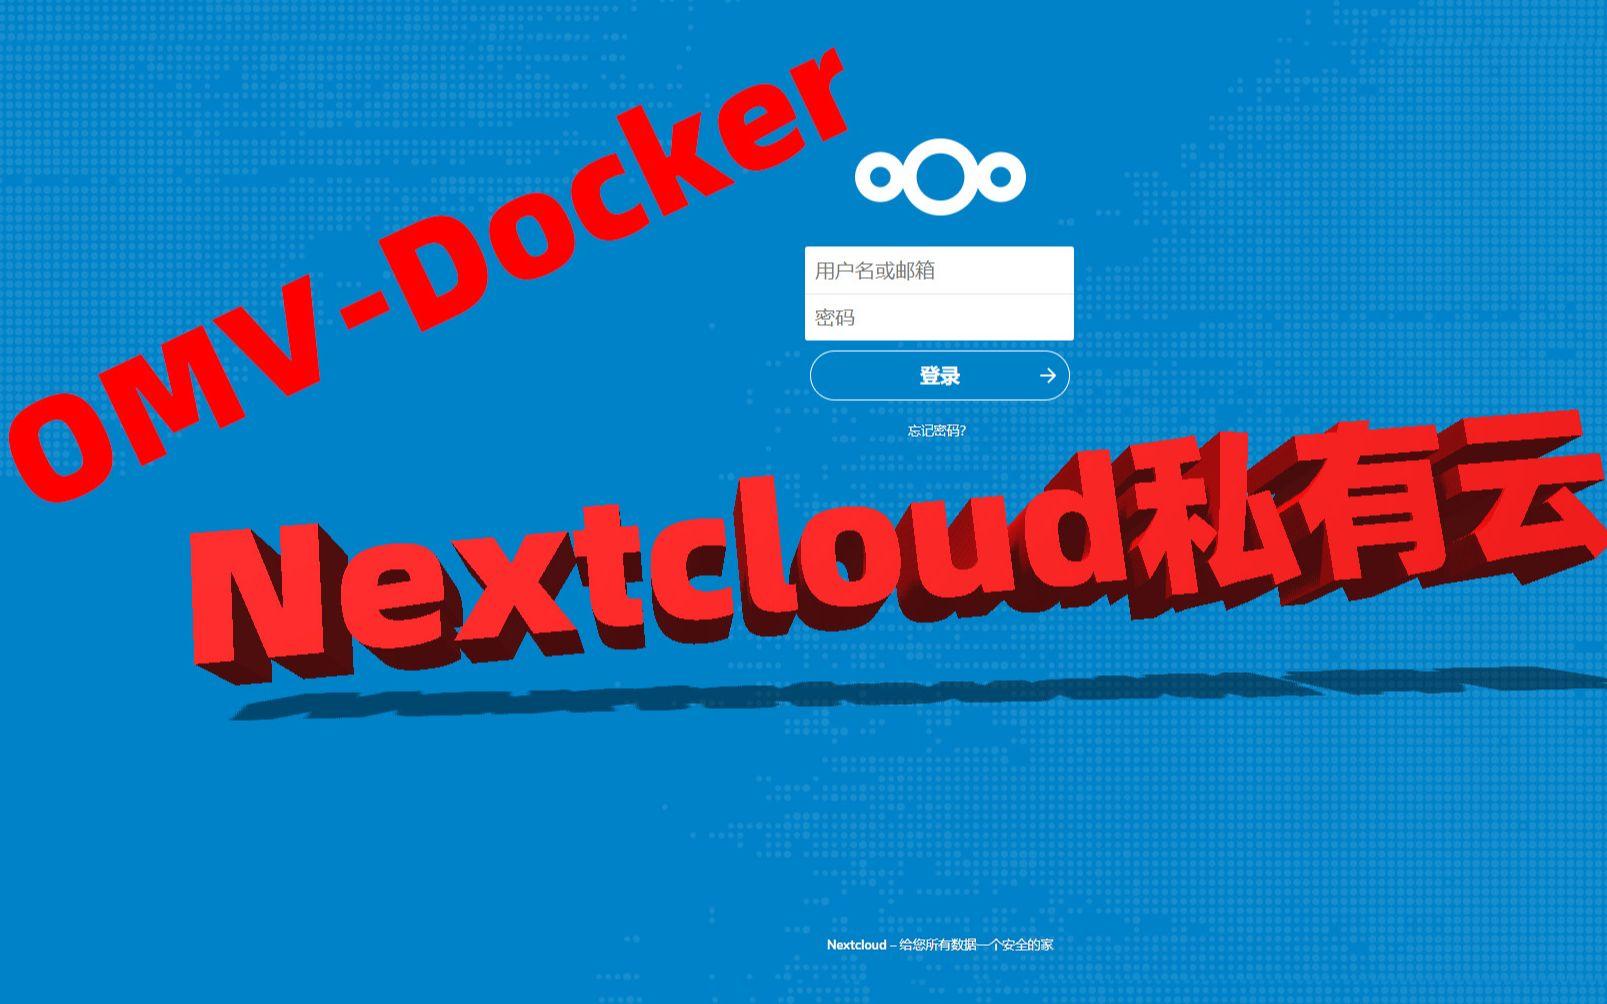 OMV系统中Nextcloud私有云的安装_哔哩哔哩 (゜-゜)つロ 干杯~-bilibili